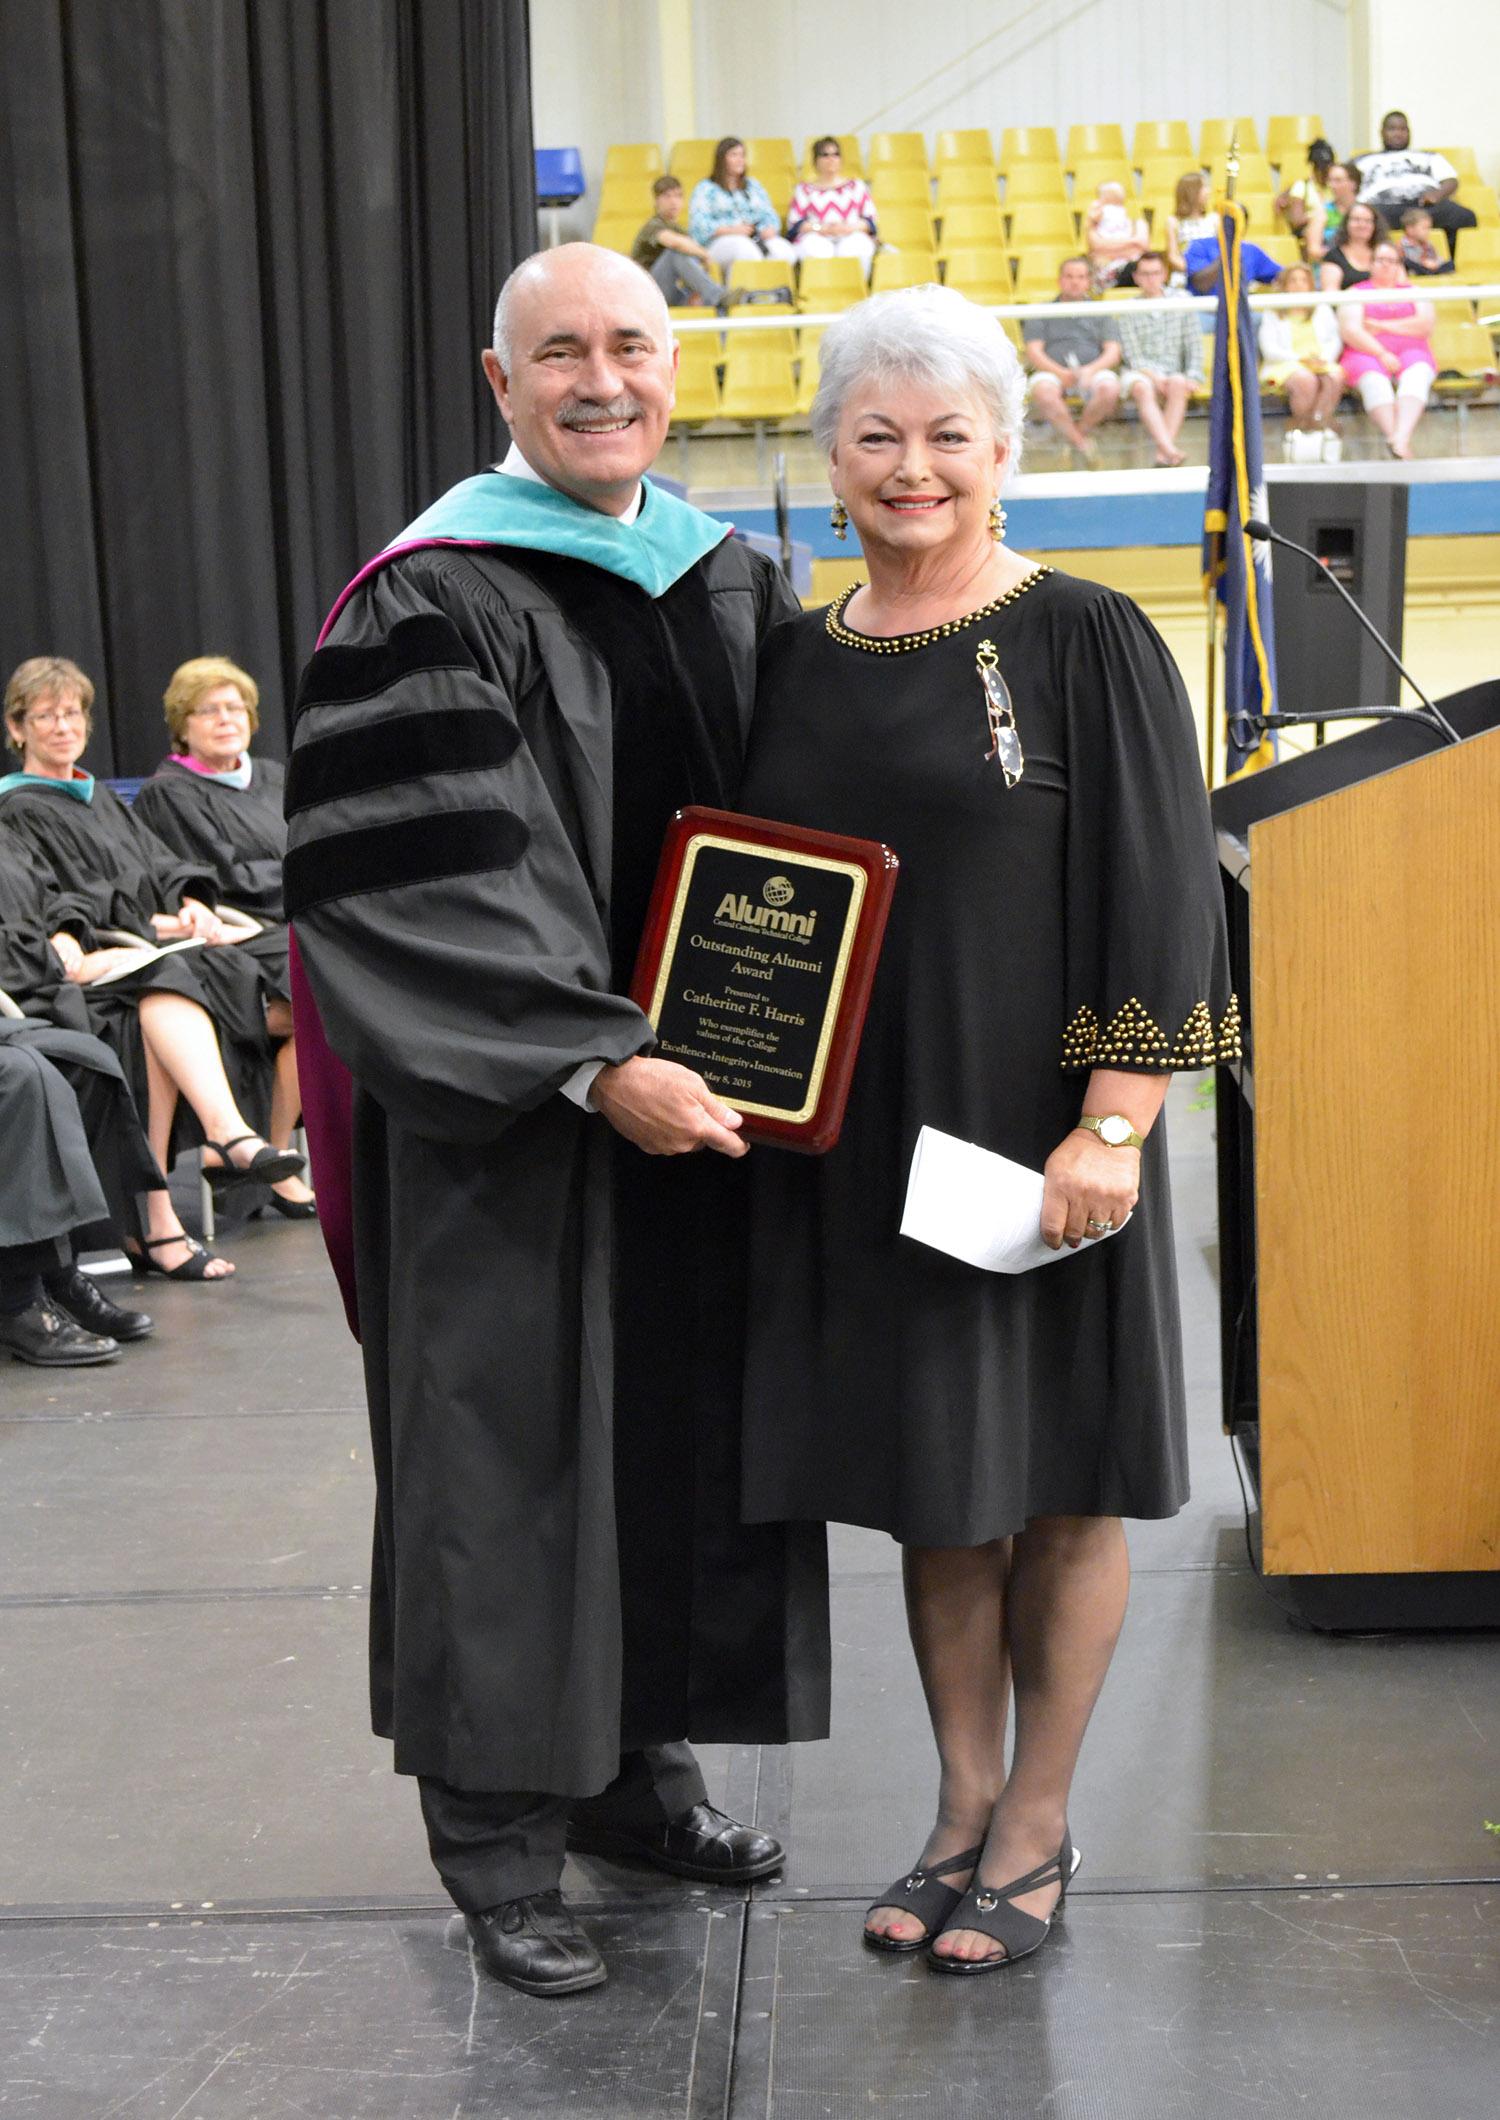 GradPic AfternoonGradCollage MorningGradCollage RedKneeceMidgette2015 DistinguishedAlumniDennis2015 DistinguishedAlumniHarris